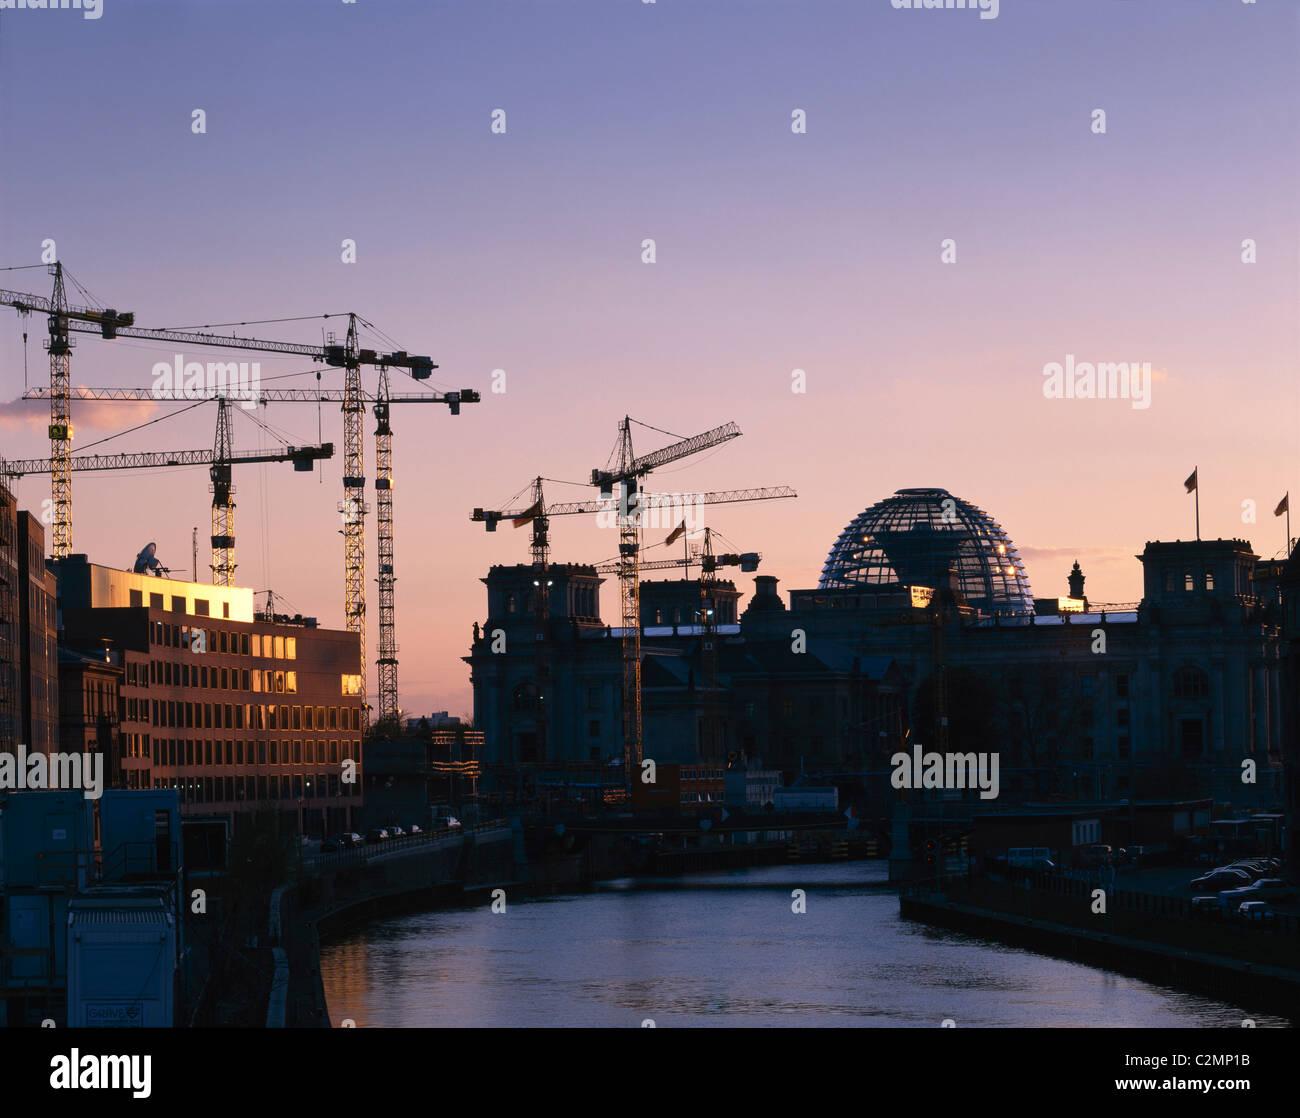 Reichstag, Platz der Republik, Berlin, Germany - Exterior with cranes - Stock Image